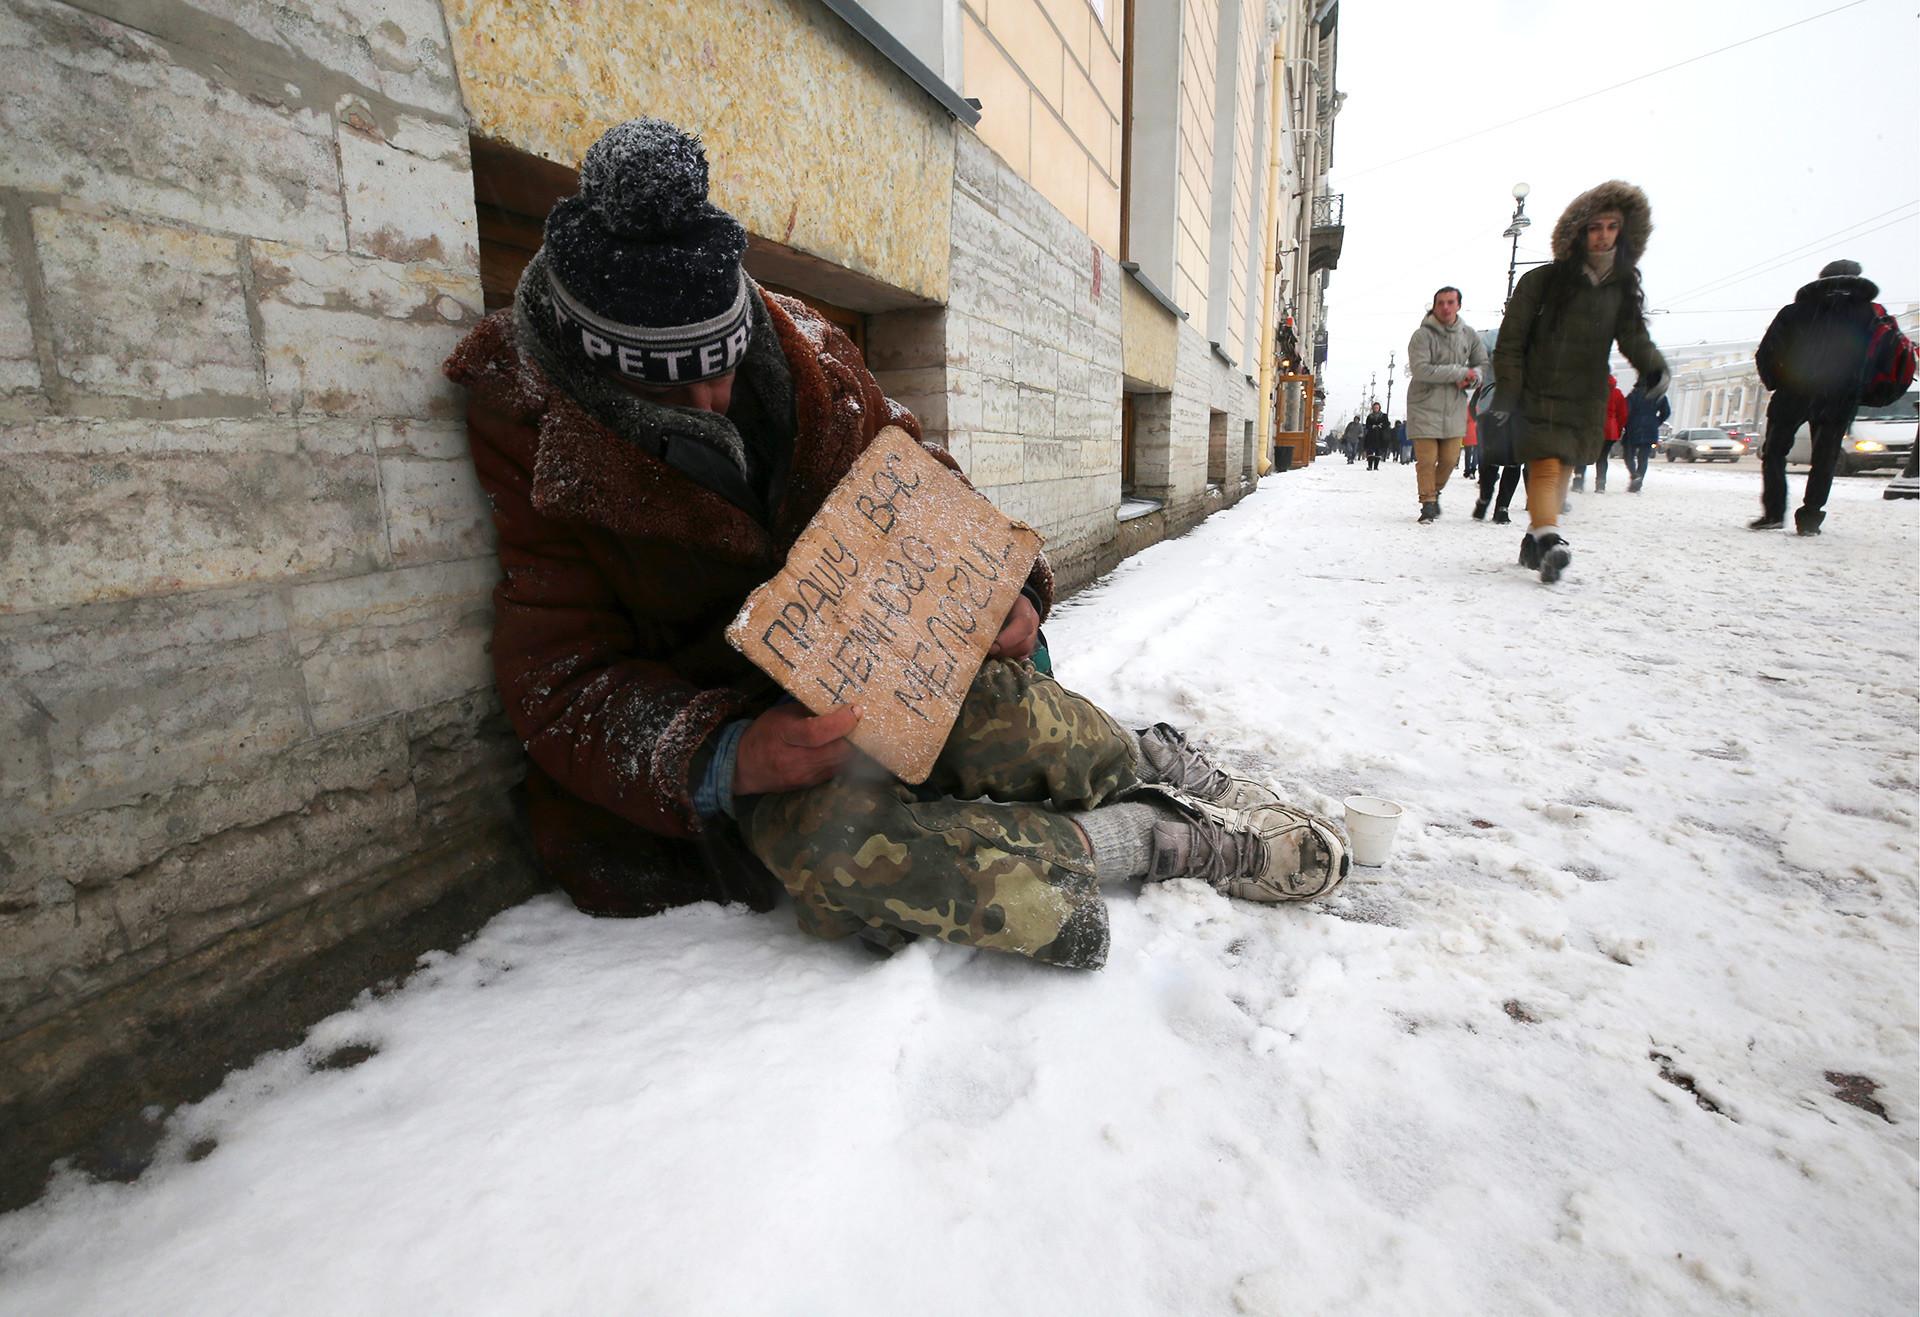 Homeless man sleeping rough, Russia